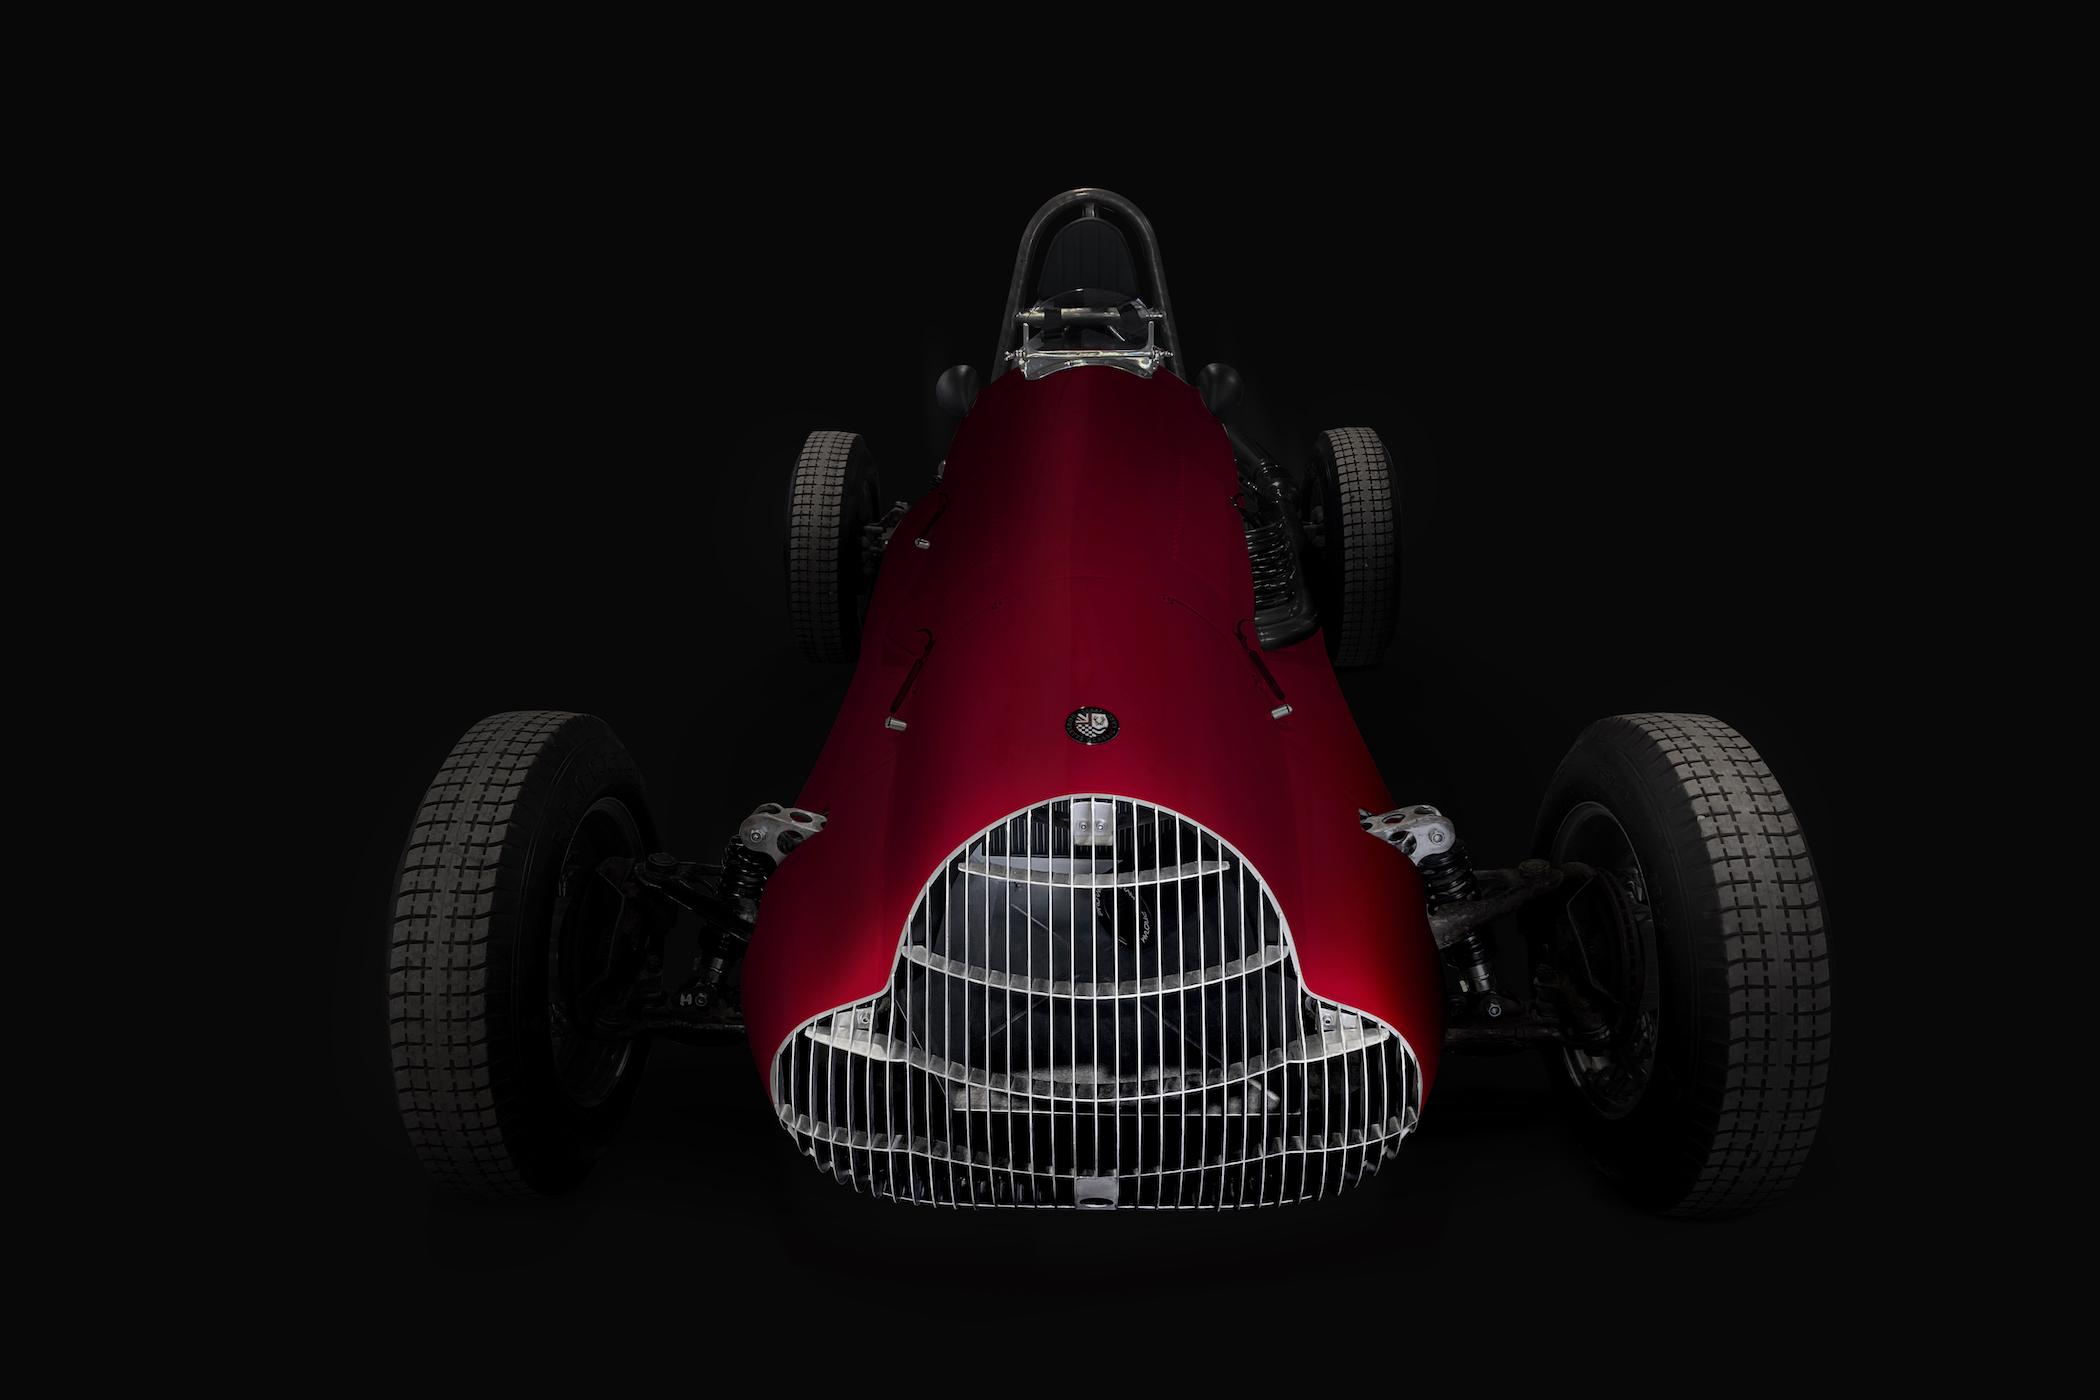 An Alfa Romeo 158 Alfetta Grand Prix Car based on a…. Mazda MX5? - Monochrome Watches